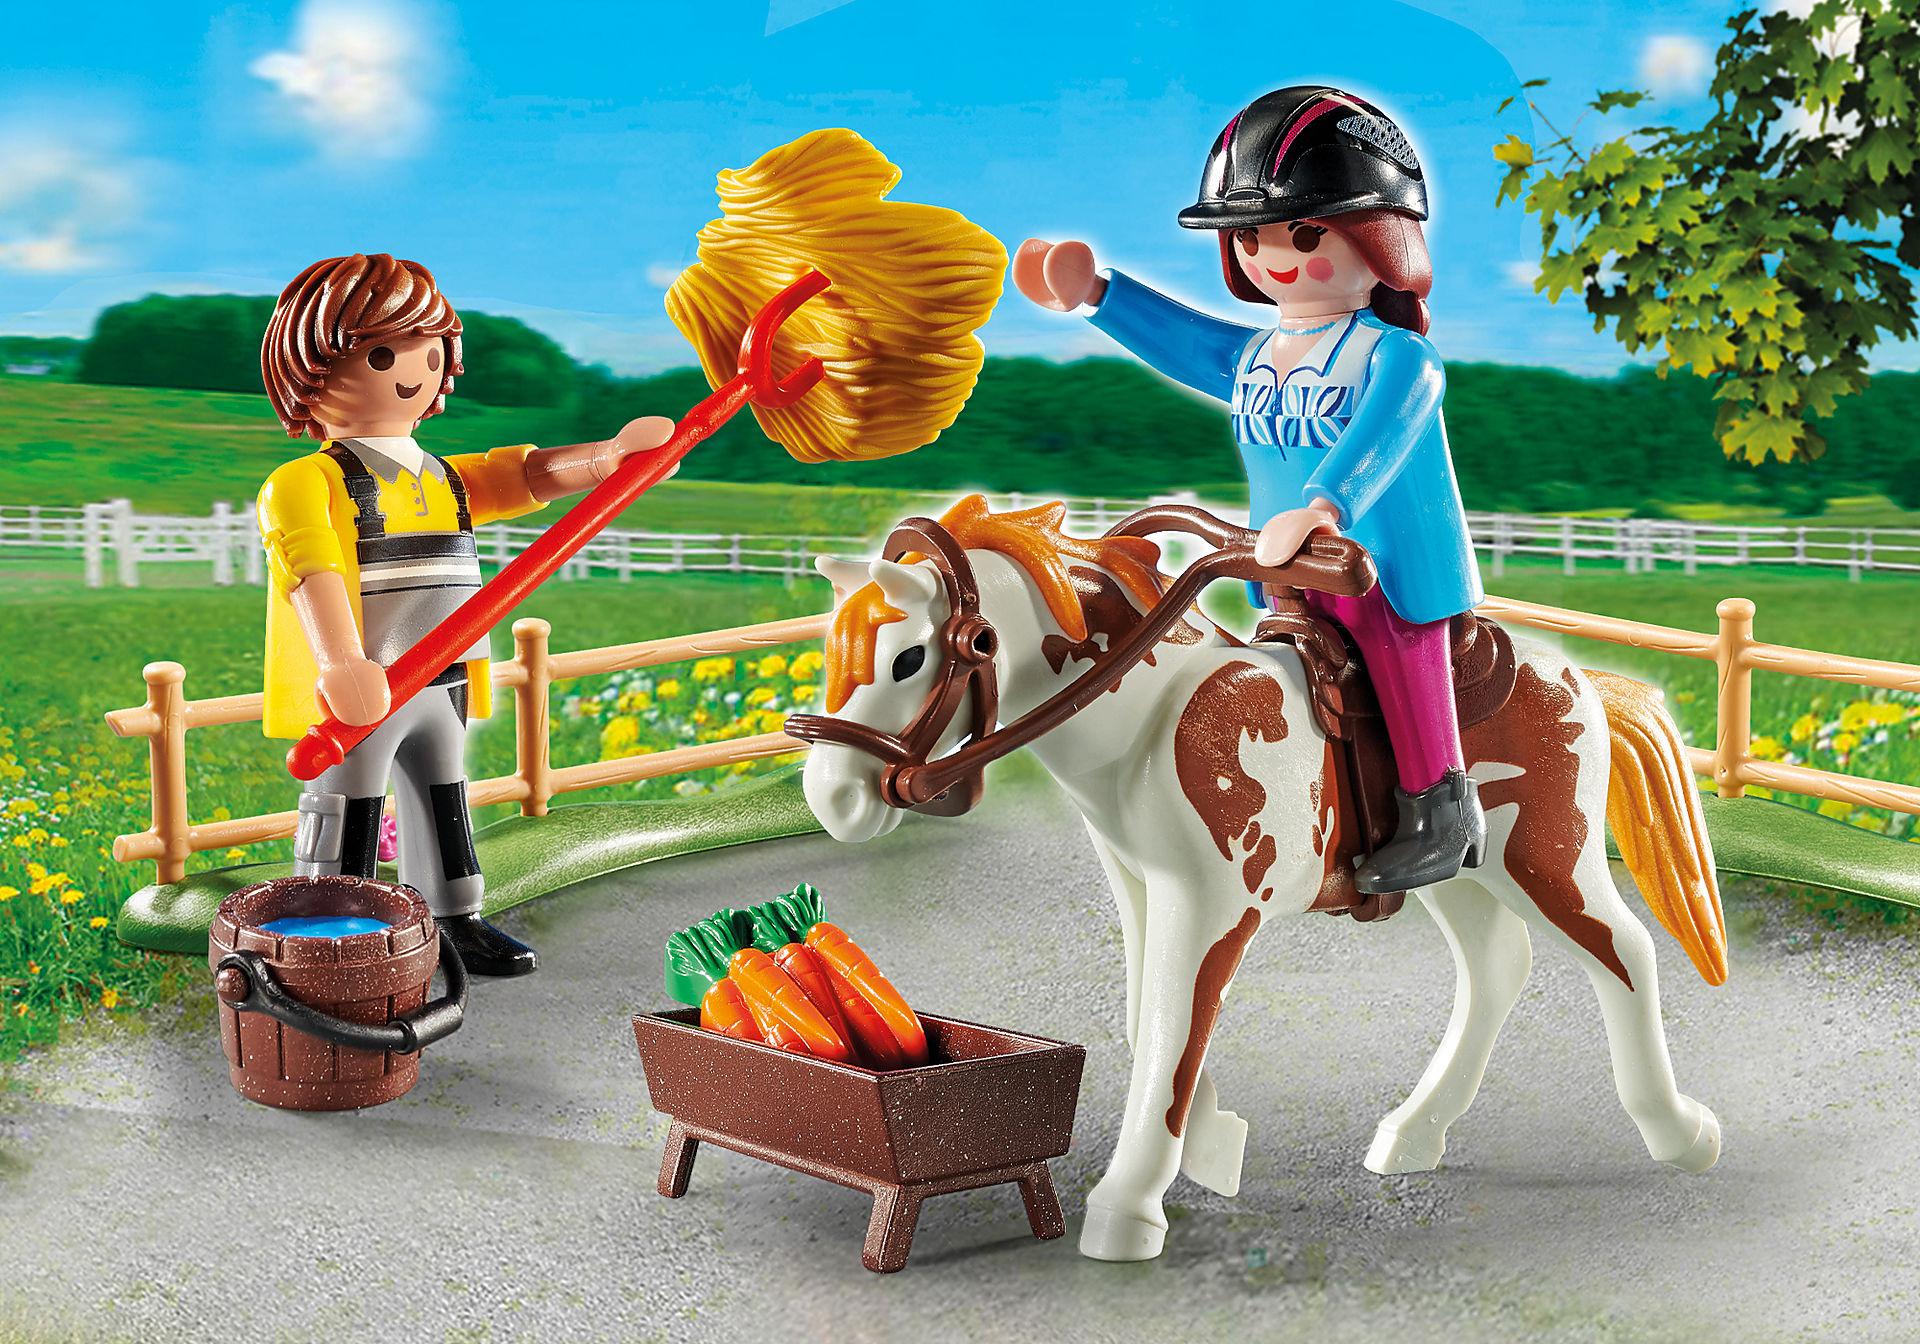 70505 Starter Pack Quinta de Cavalos set adicional zoom image1